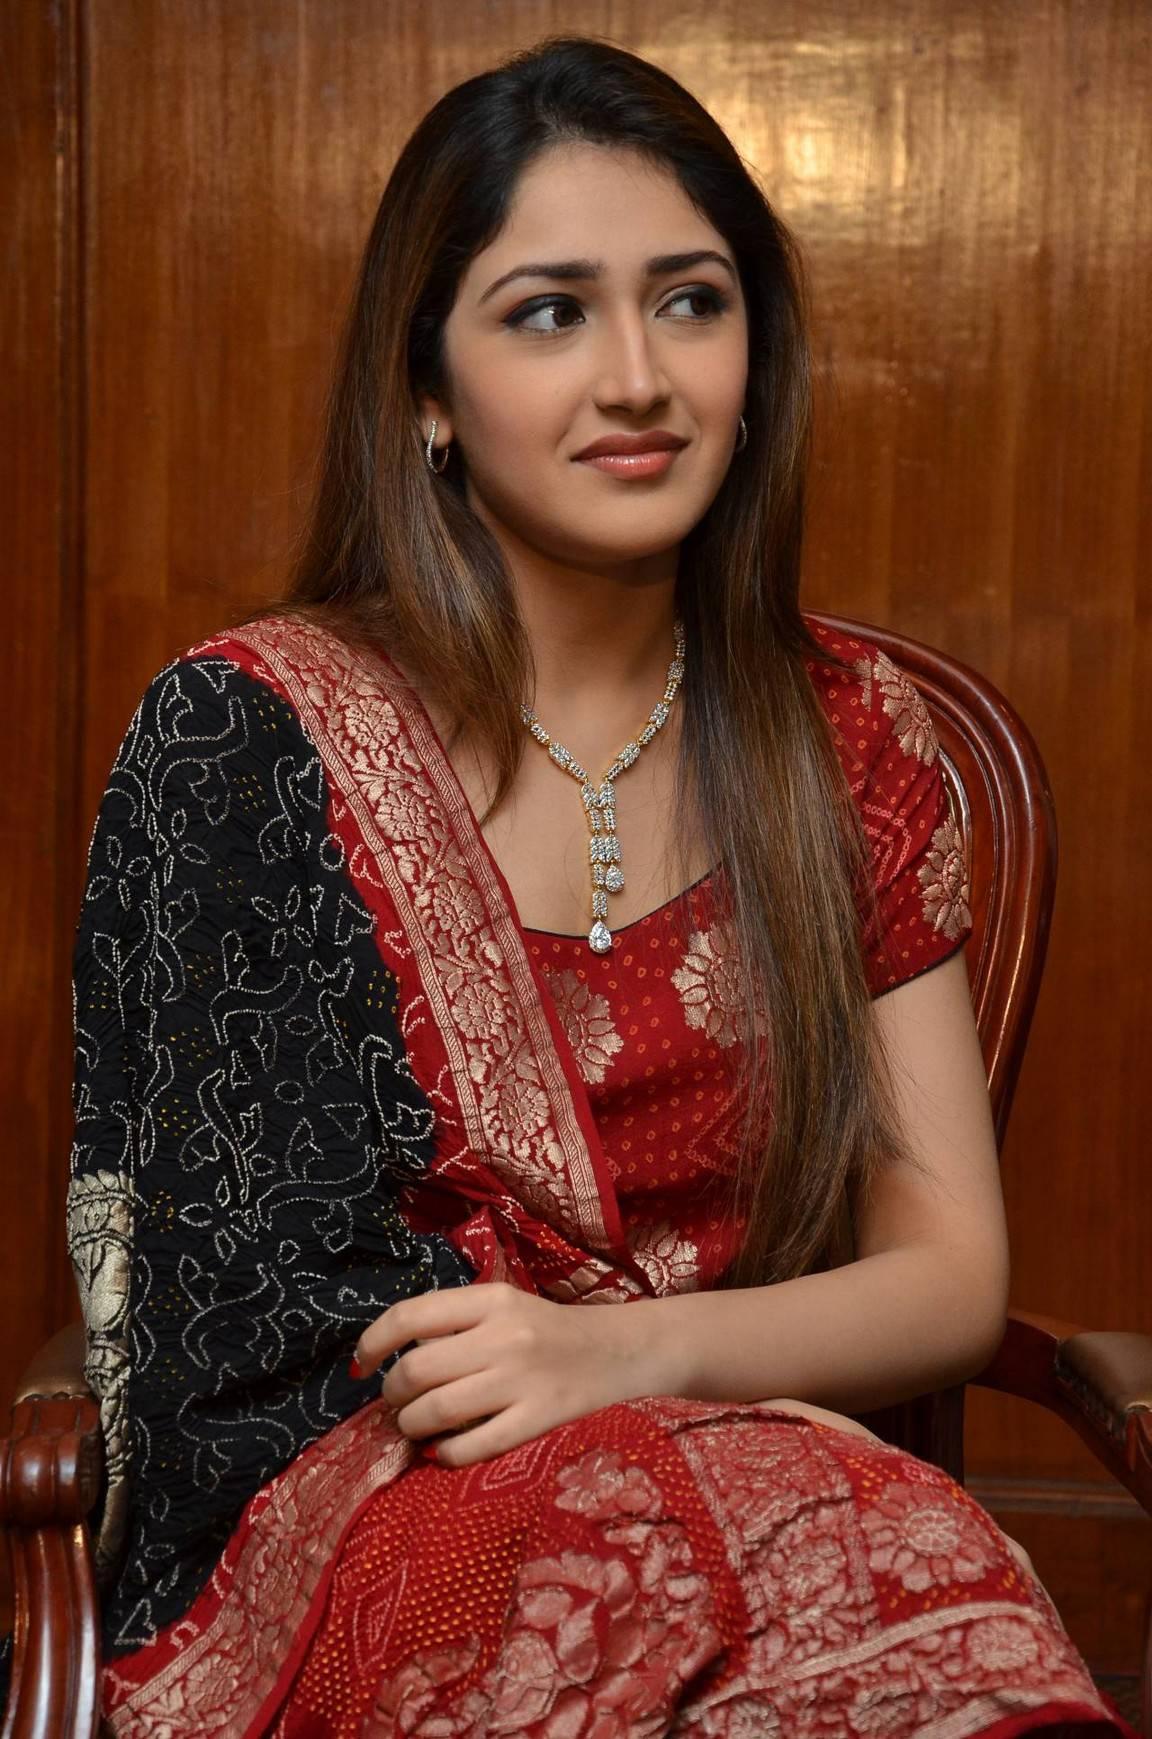 Sayesha Saigal hot photos in saree